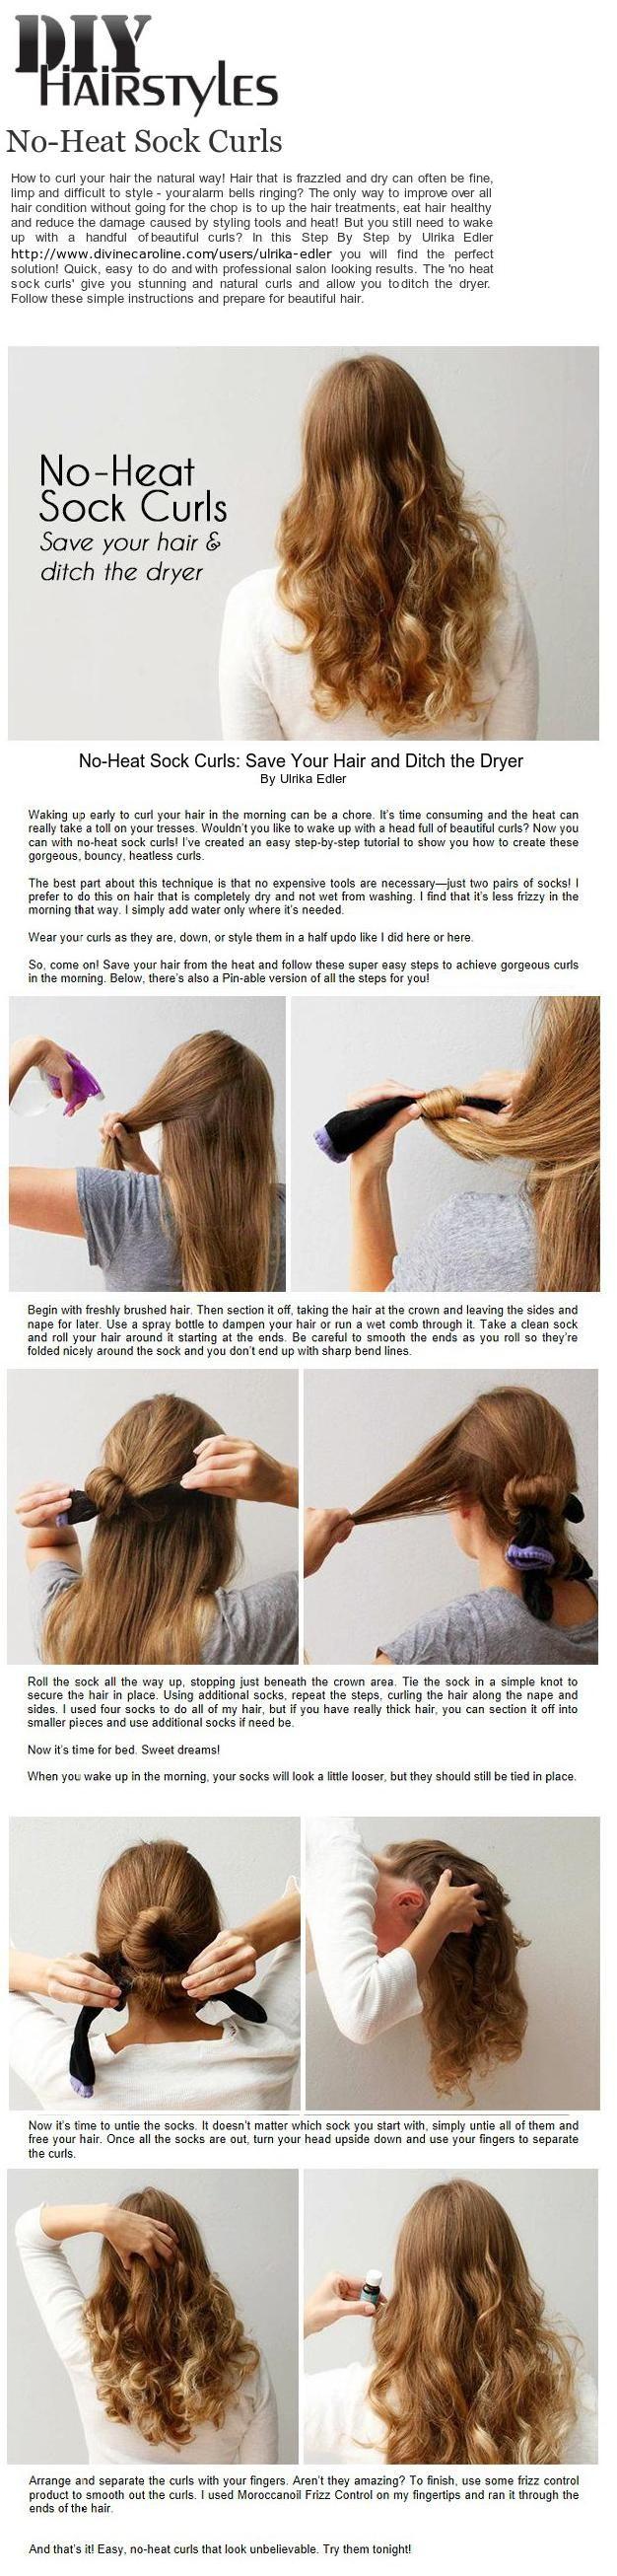 DIY Hairstyles No-Heat Sock Curls #sockcurls